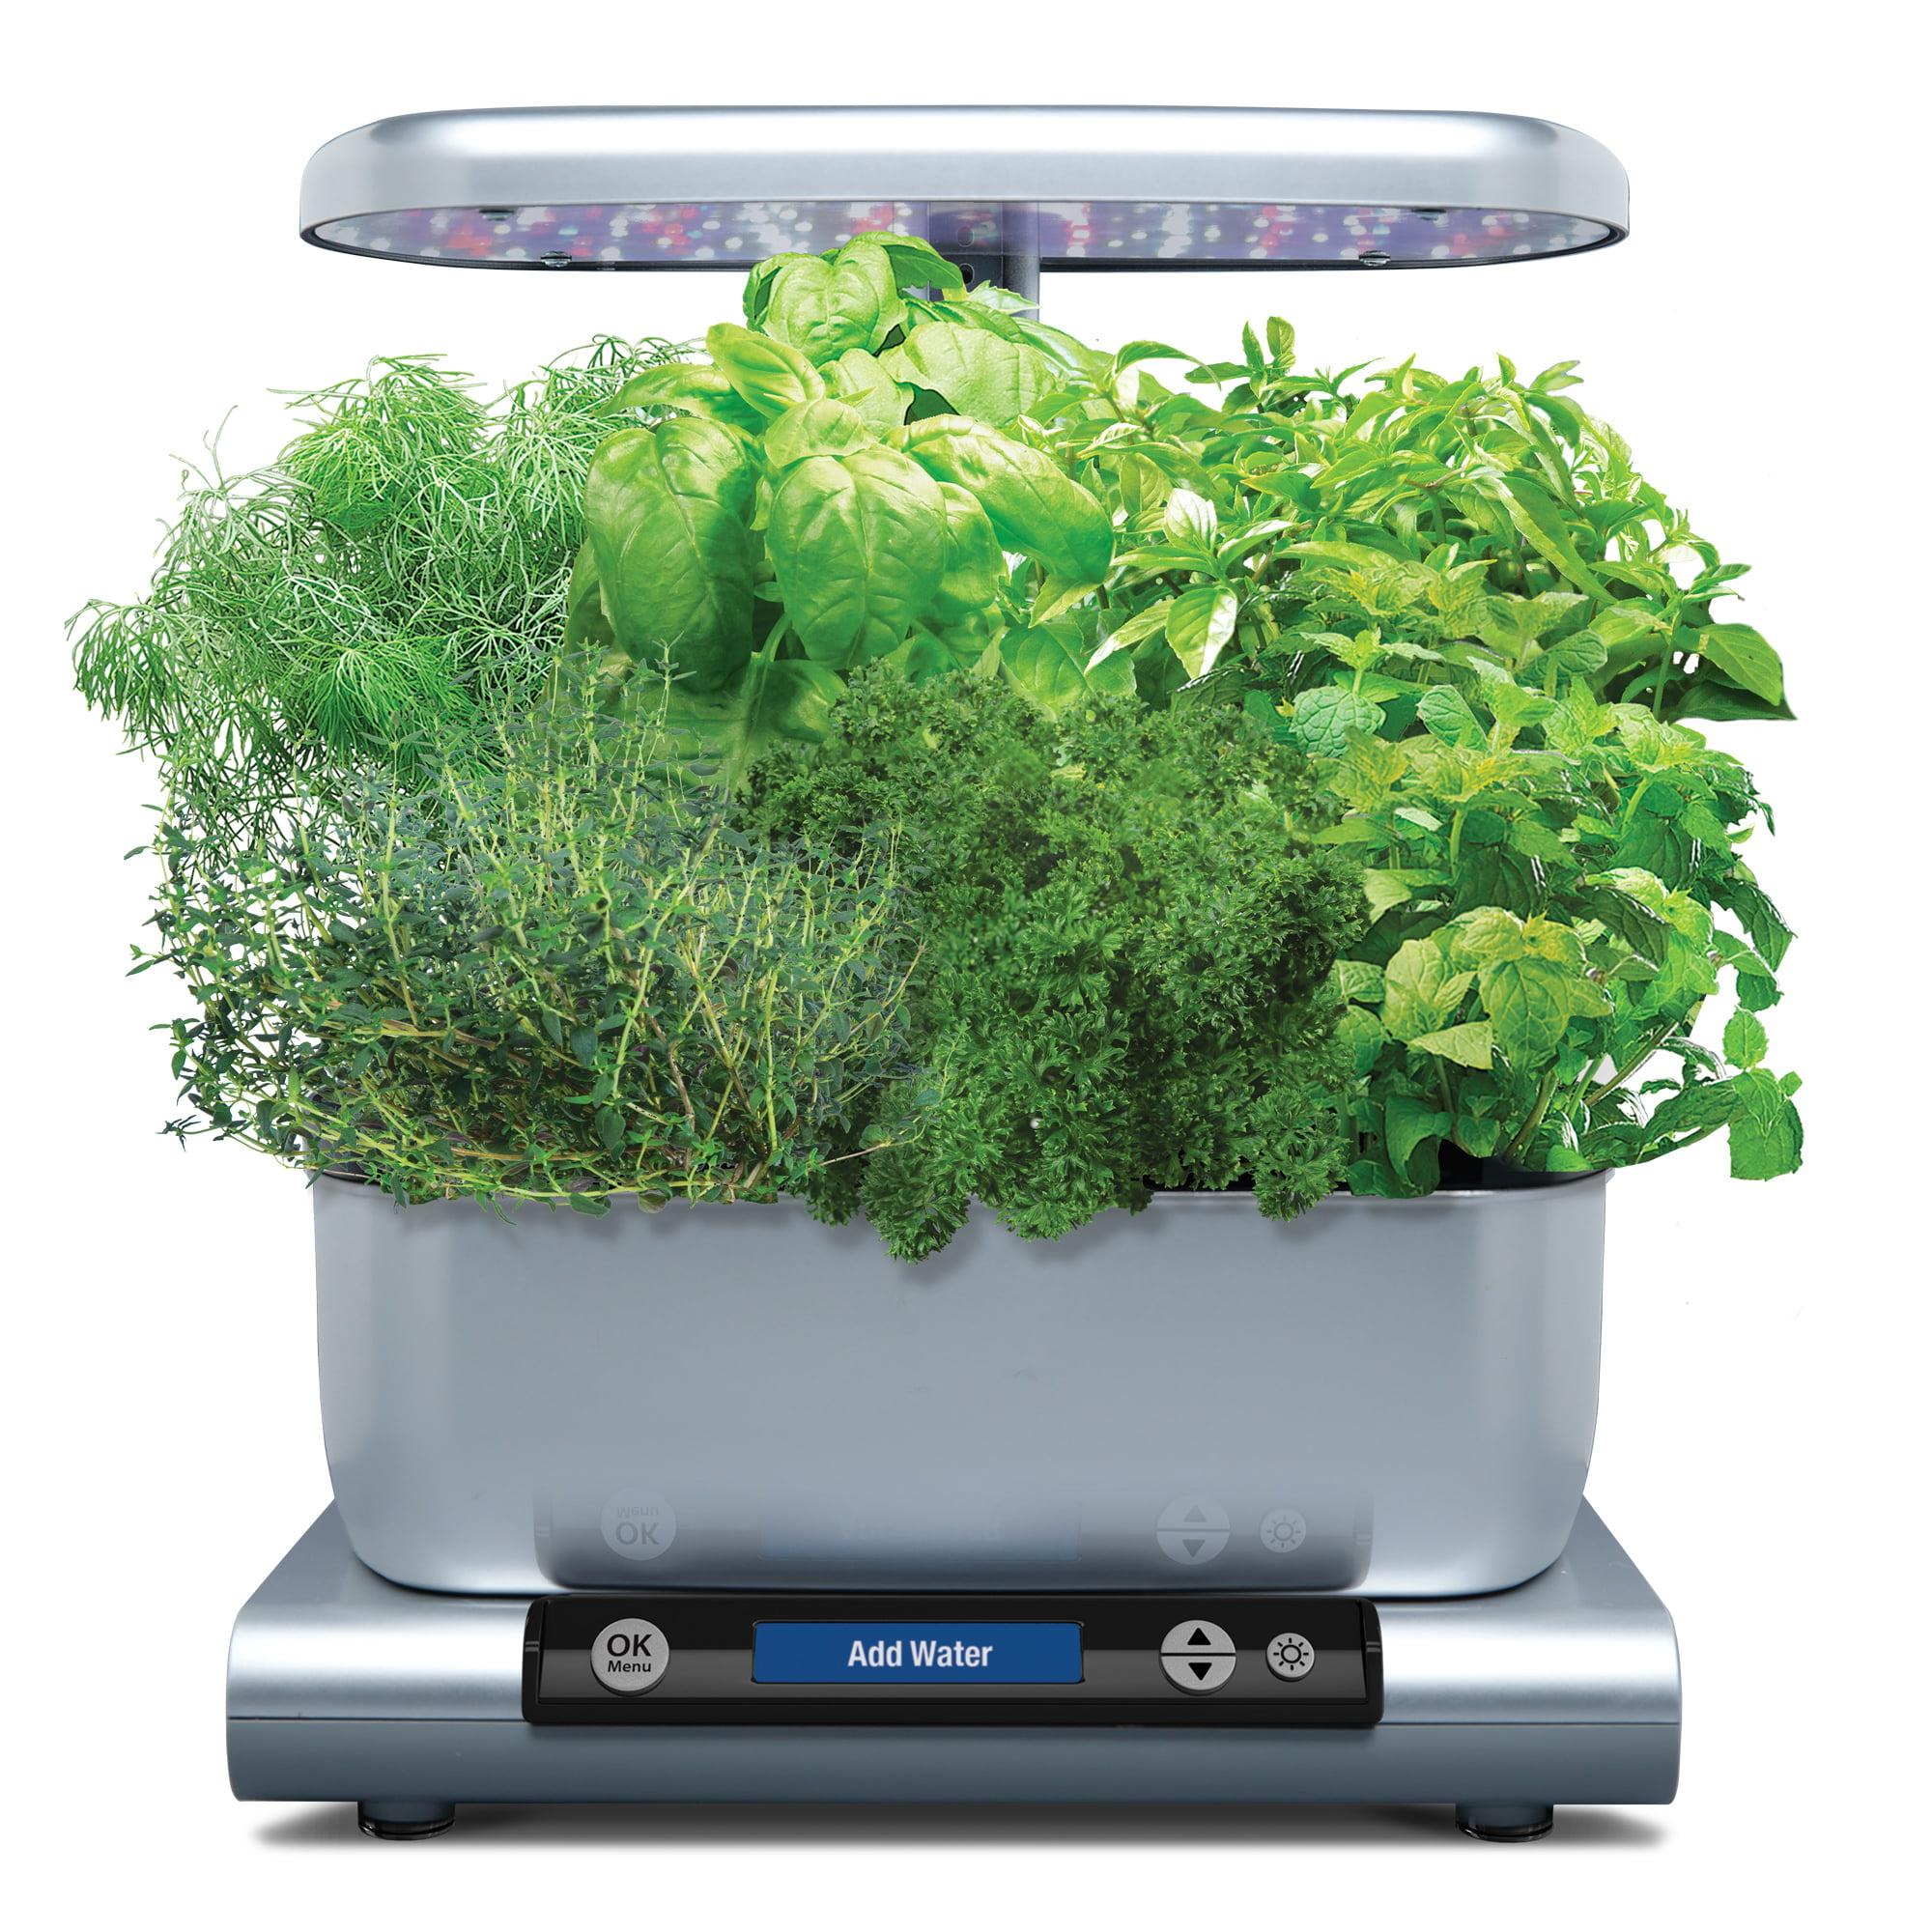 AeroGarden Harvest Premium, Platinum with Gourmet Herbs Seed Kit -  Walmart.com